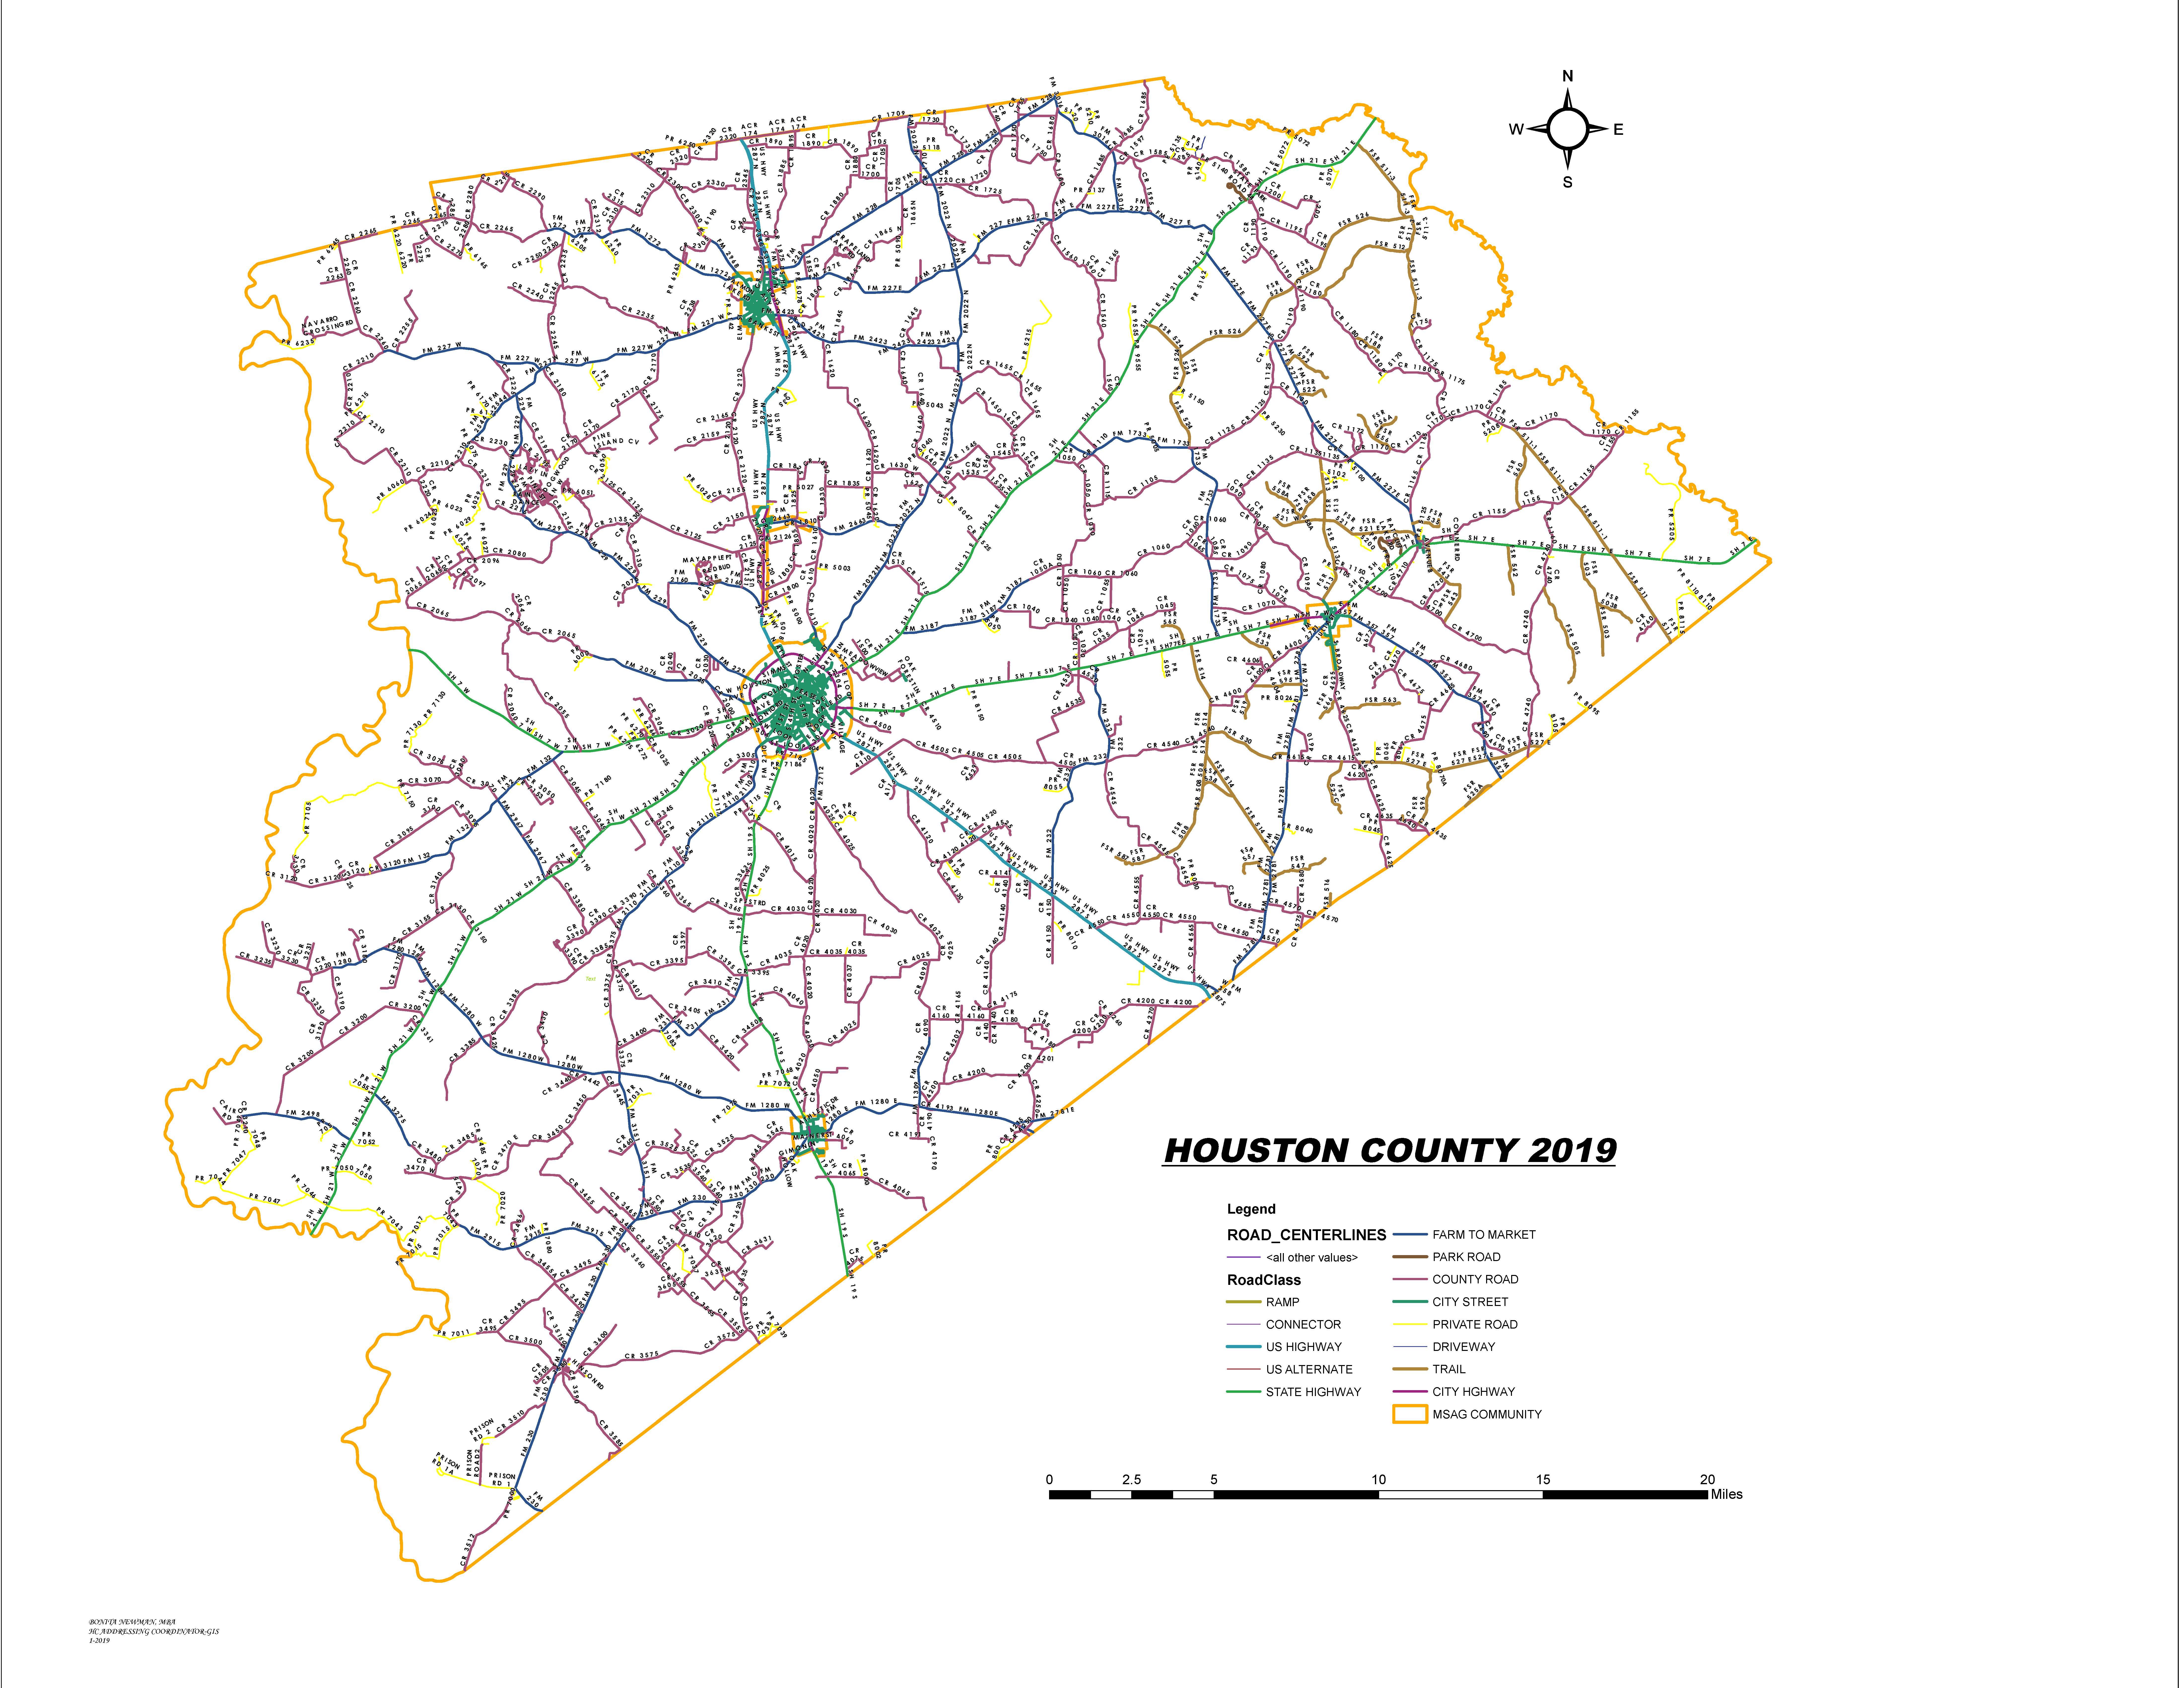 Houston County Texas